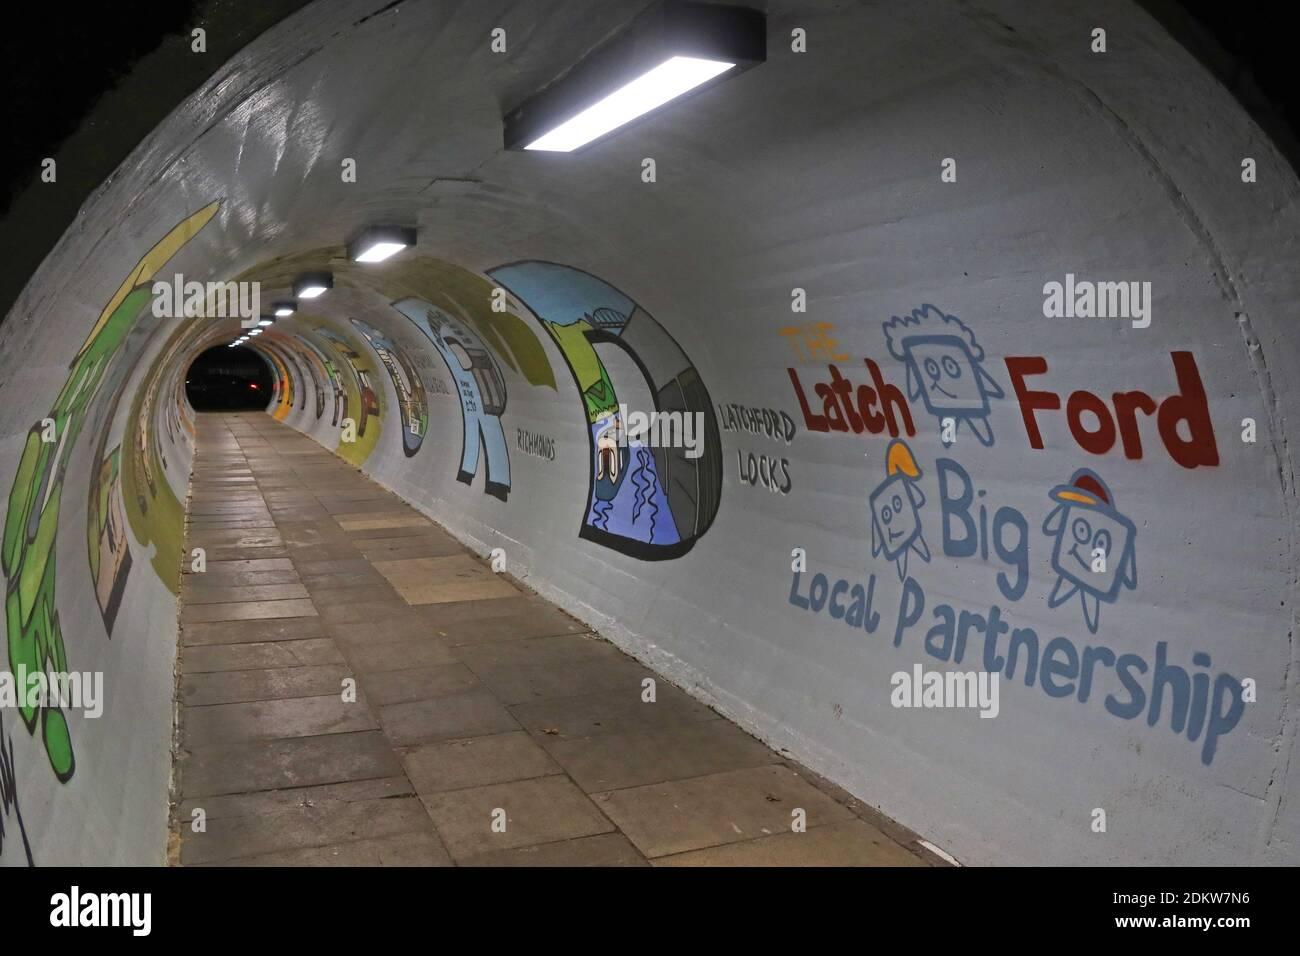 Dieses Stockfoto: A50, Fußgängertunnel, Latchy, The Latchford Partnership, Knutsford Road, Latchford, Warrington, Cheshire, England, Großbritannien, WA4 - 2DKW7N